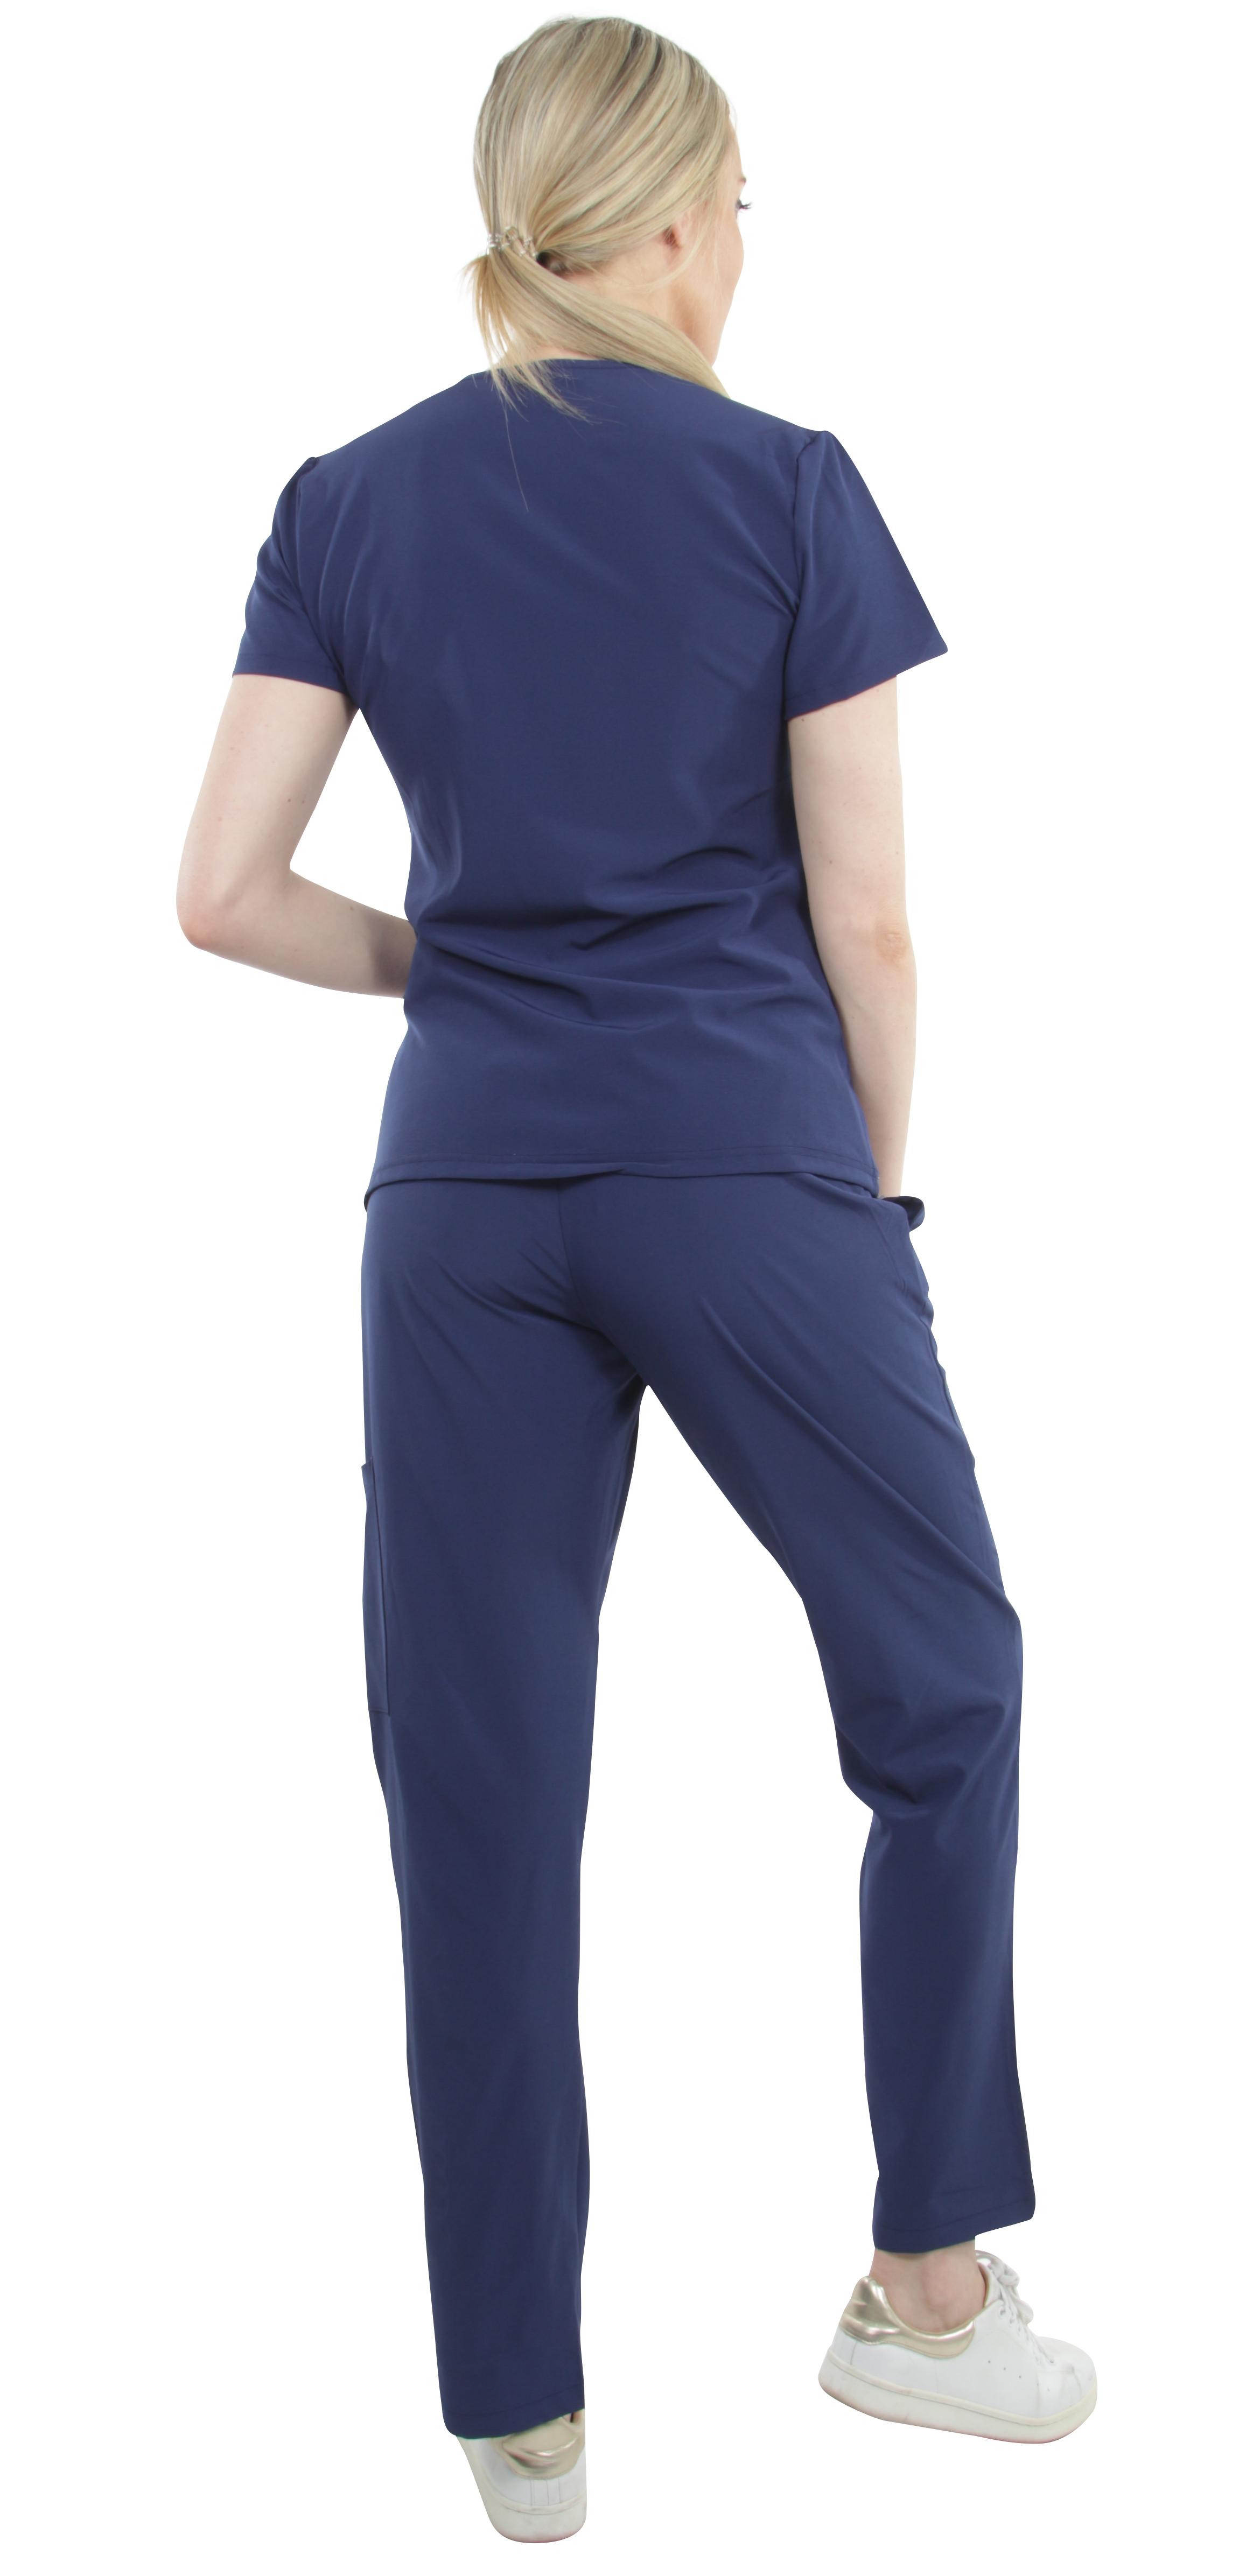 Unisex-Performance-Stretch-Medical-Uniform-Five-Pockets-V-Neck-Scrubs-Sets miniature 34